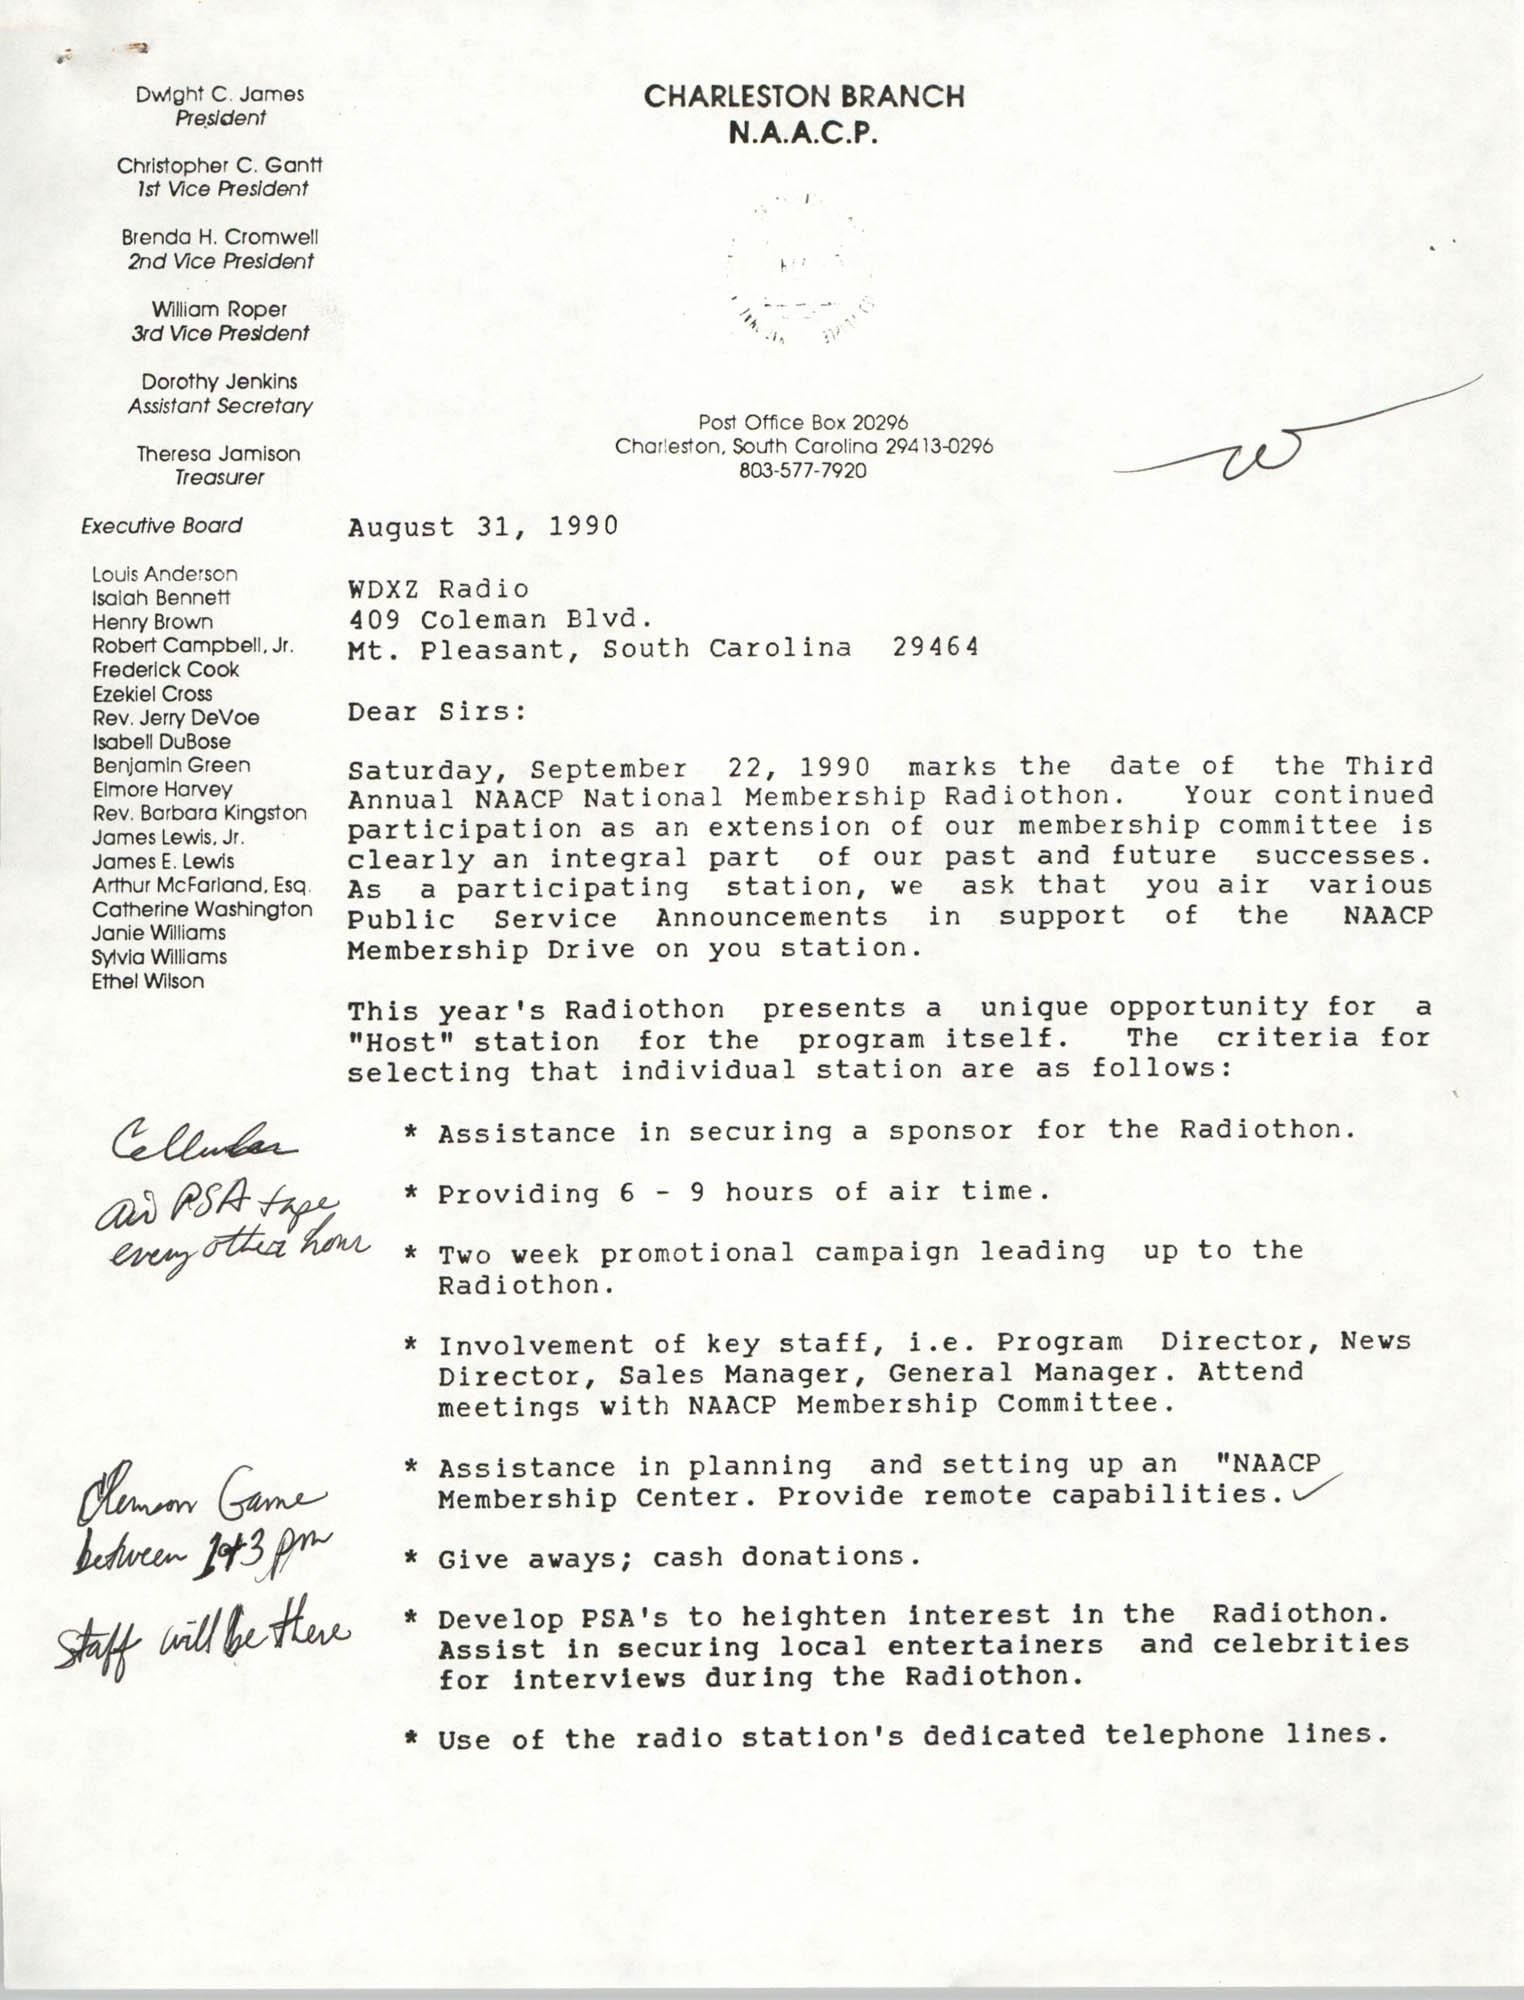 Letter from Hilda D. Gadsden to WDXZ Radio, August 31, 1990